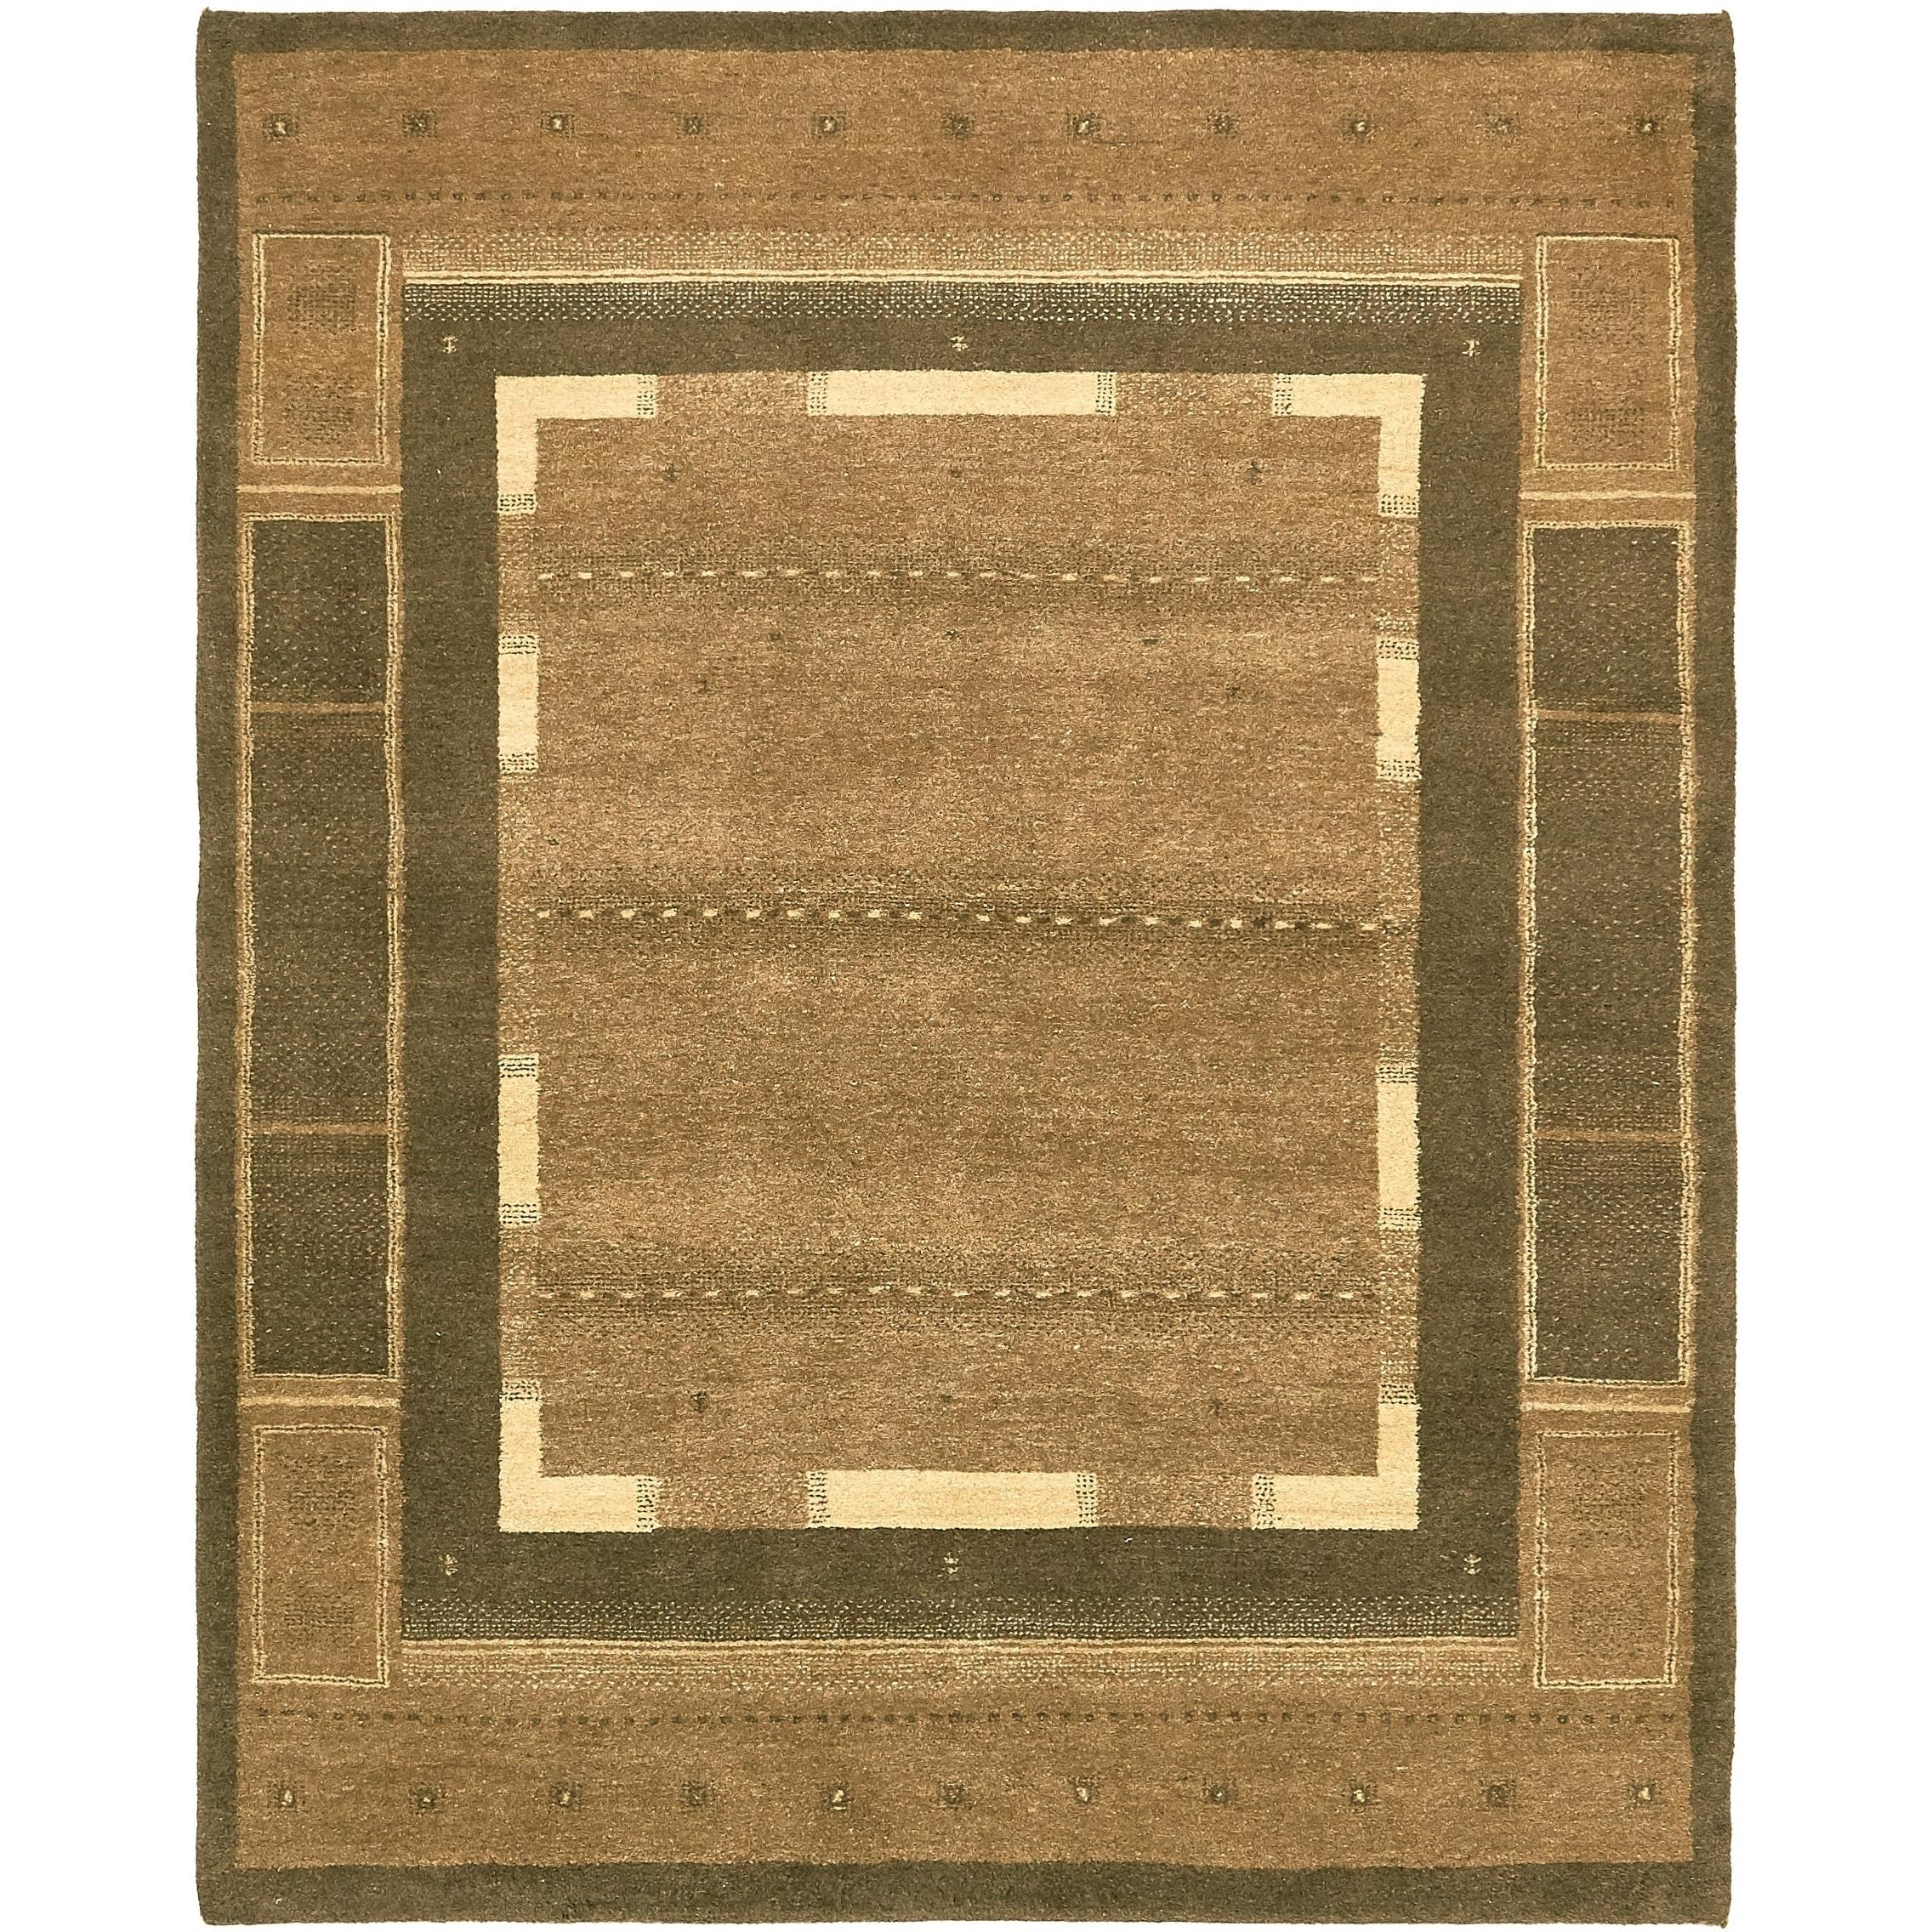 Hand Knotted Kashkuli Gabbeh Wool Area Rug - 6 3 x 7 9 (Brown - 6 3 x 7 9)